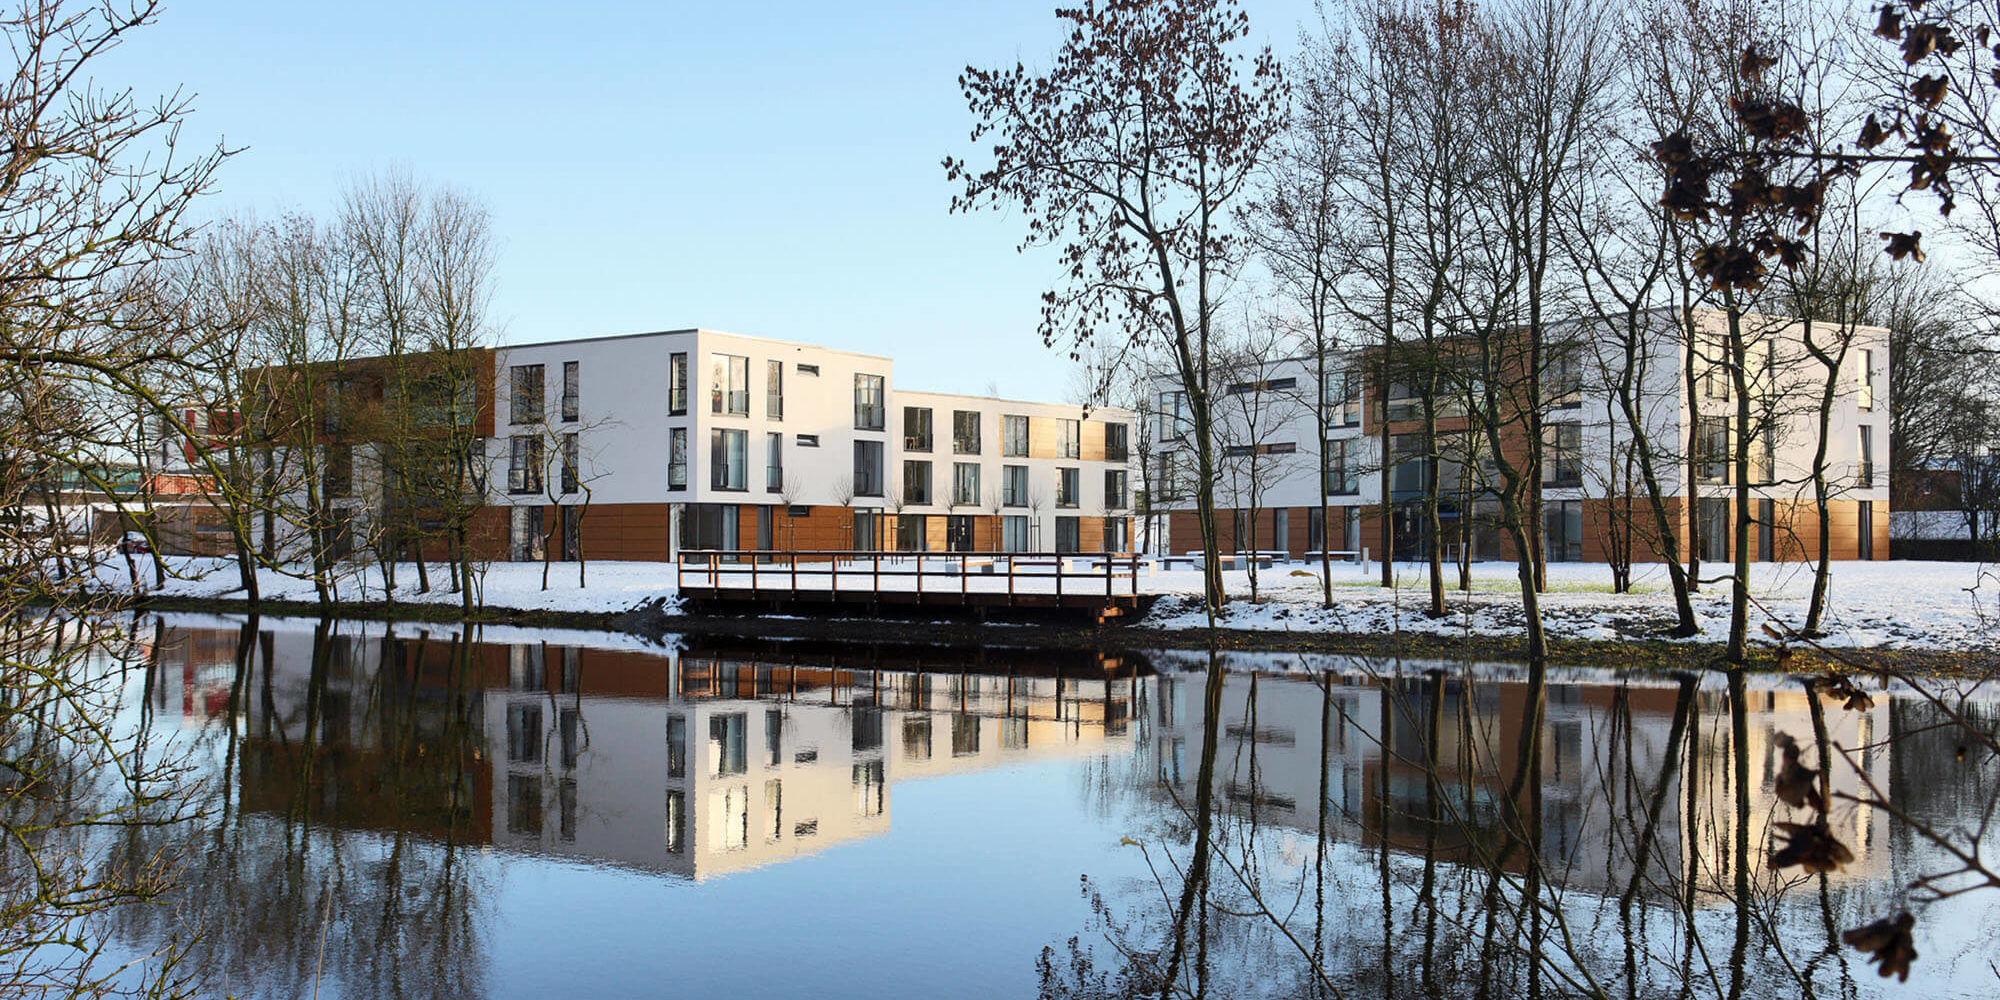 Studentenwohnheim Sea Academy, Elsfleth